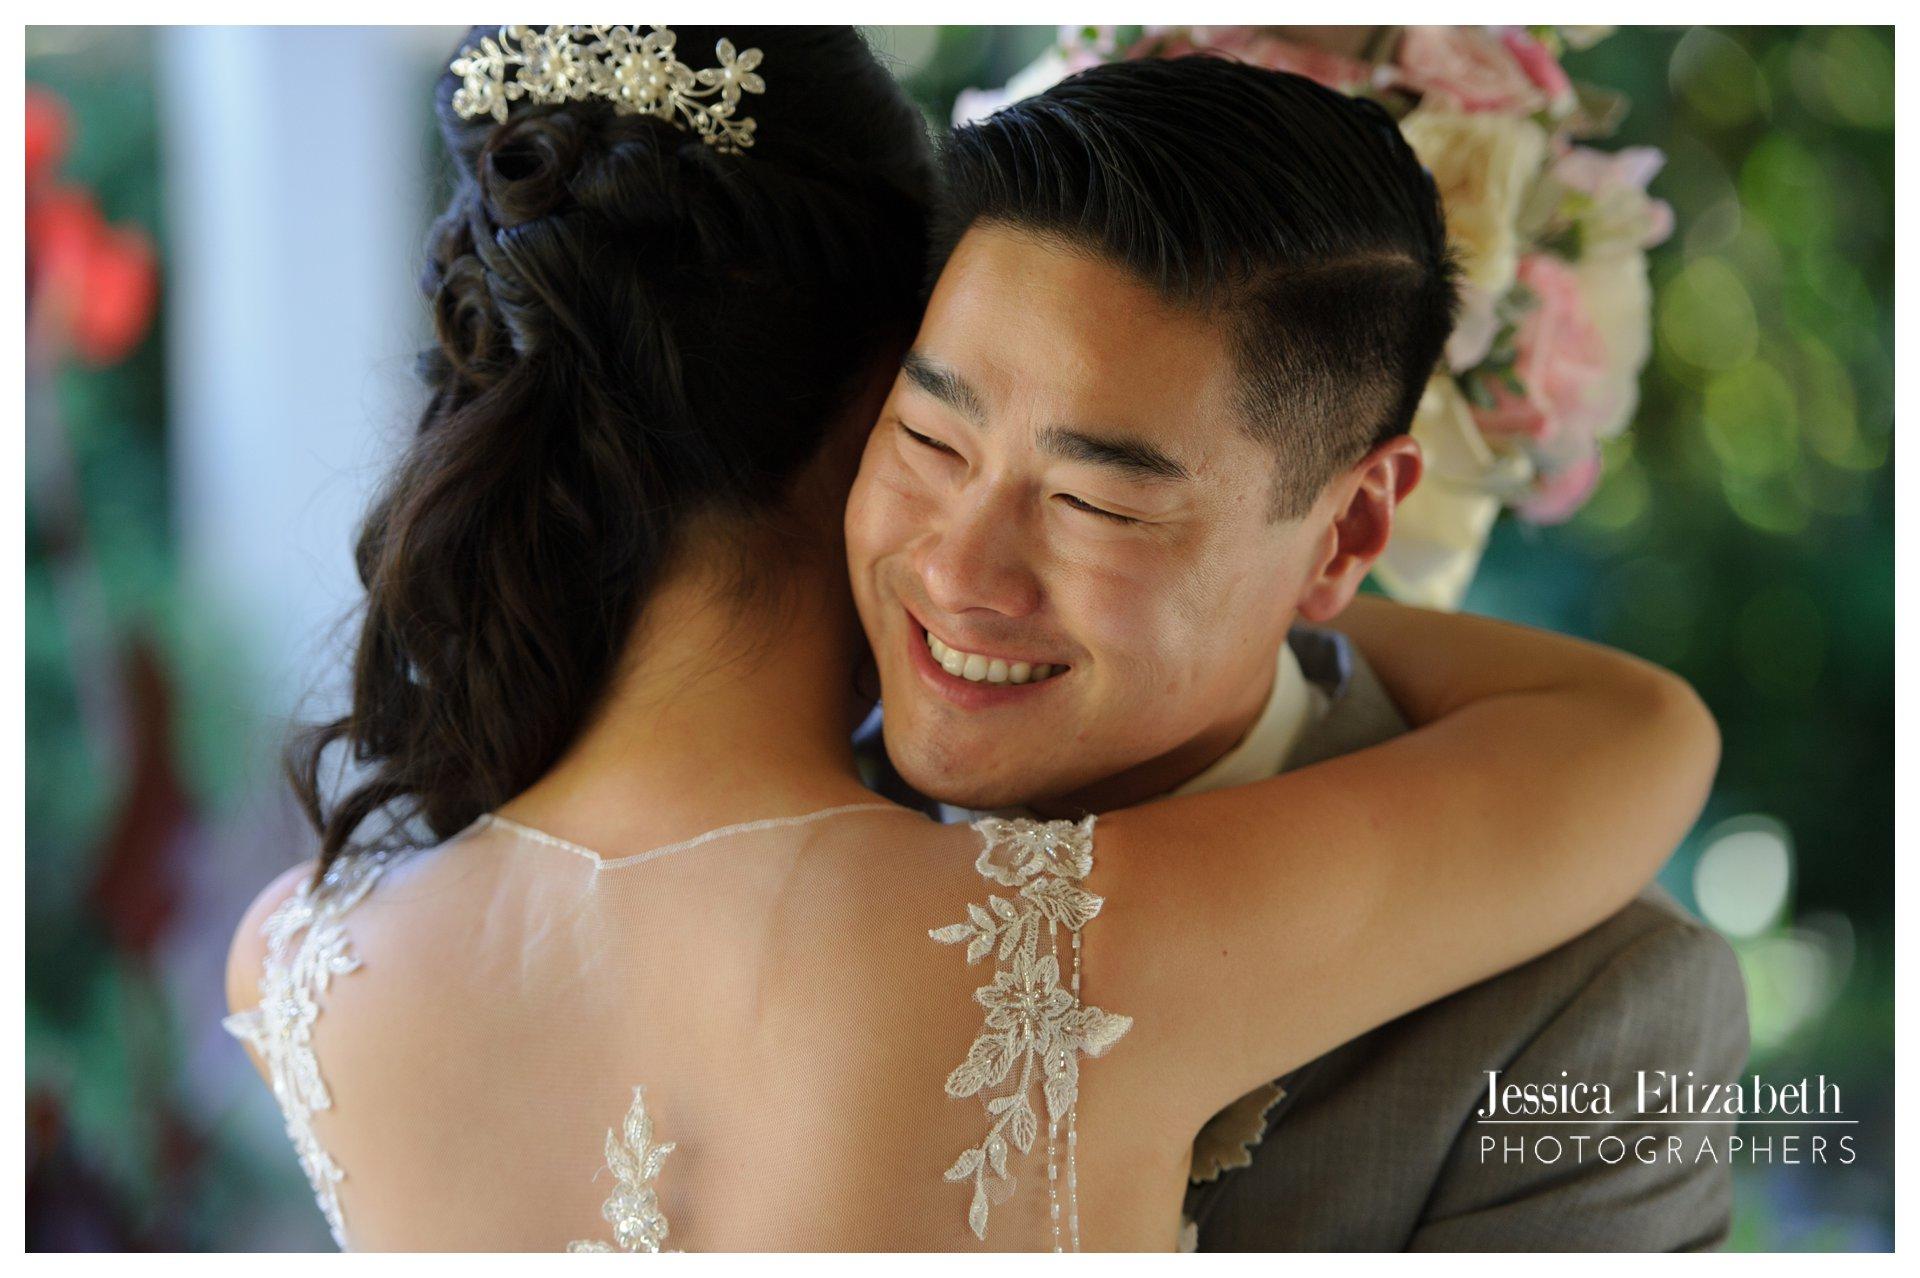 03-South-Coast-Botanic-Garden-Palos-Verdes-Wedding-Photography-by-Jessica-Elizabeth.jpg